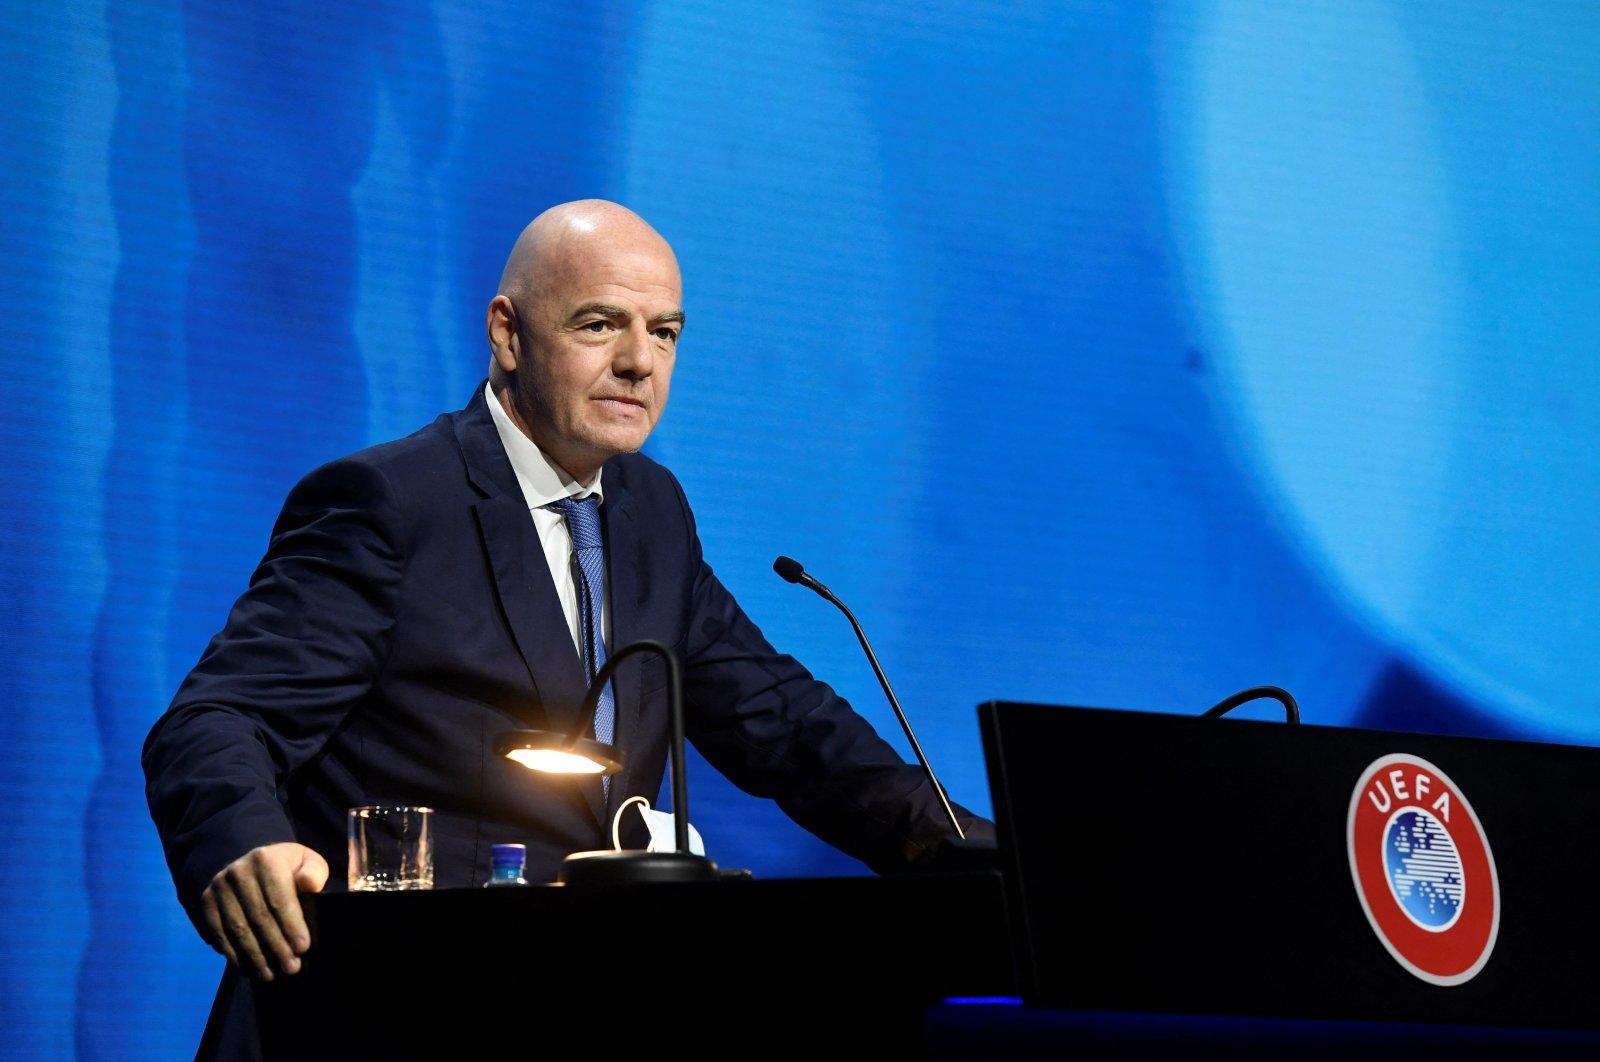 FIFA President Gianni Infantino addresses the UEFA Congress in Montreux, Switzerland, April 20, 2021. (UEFA/AFP Photo)